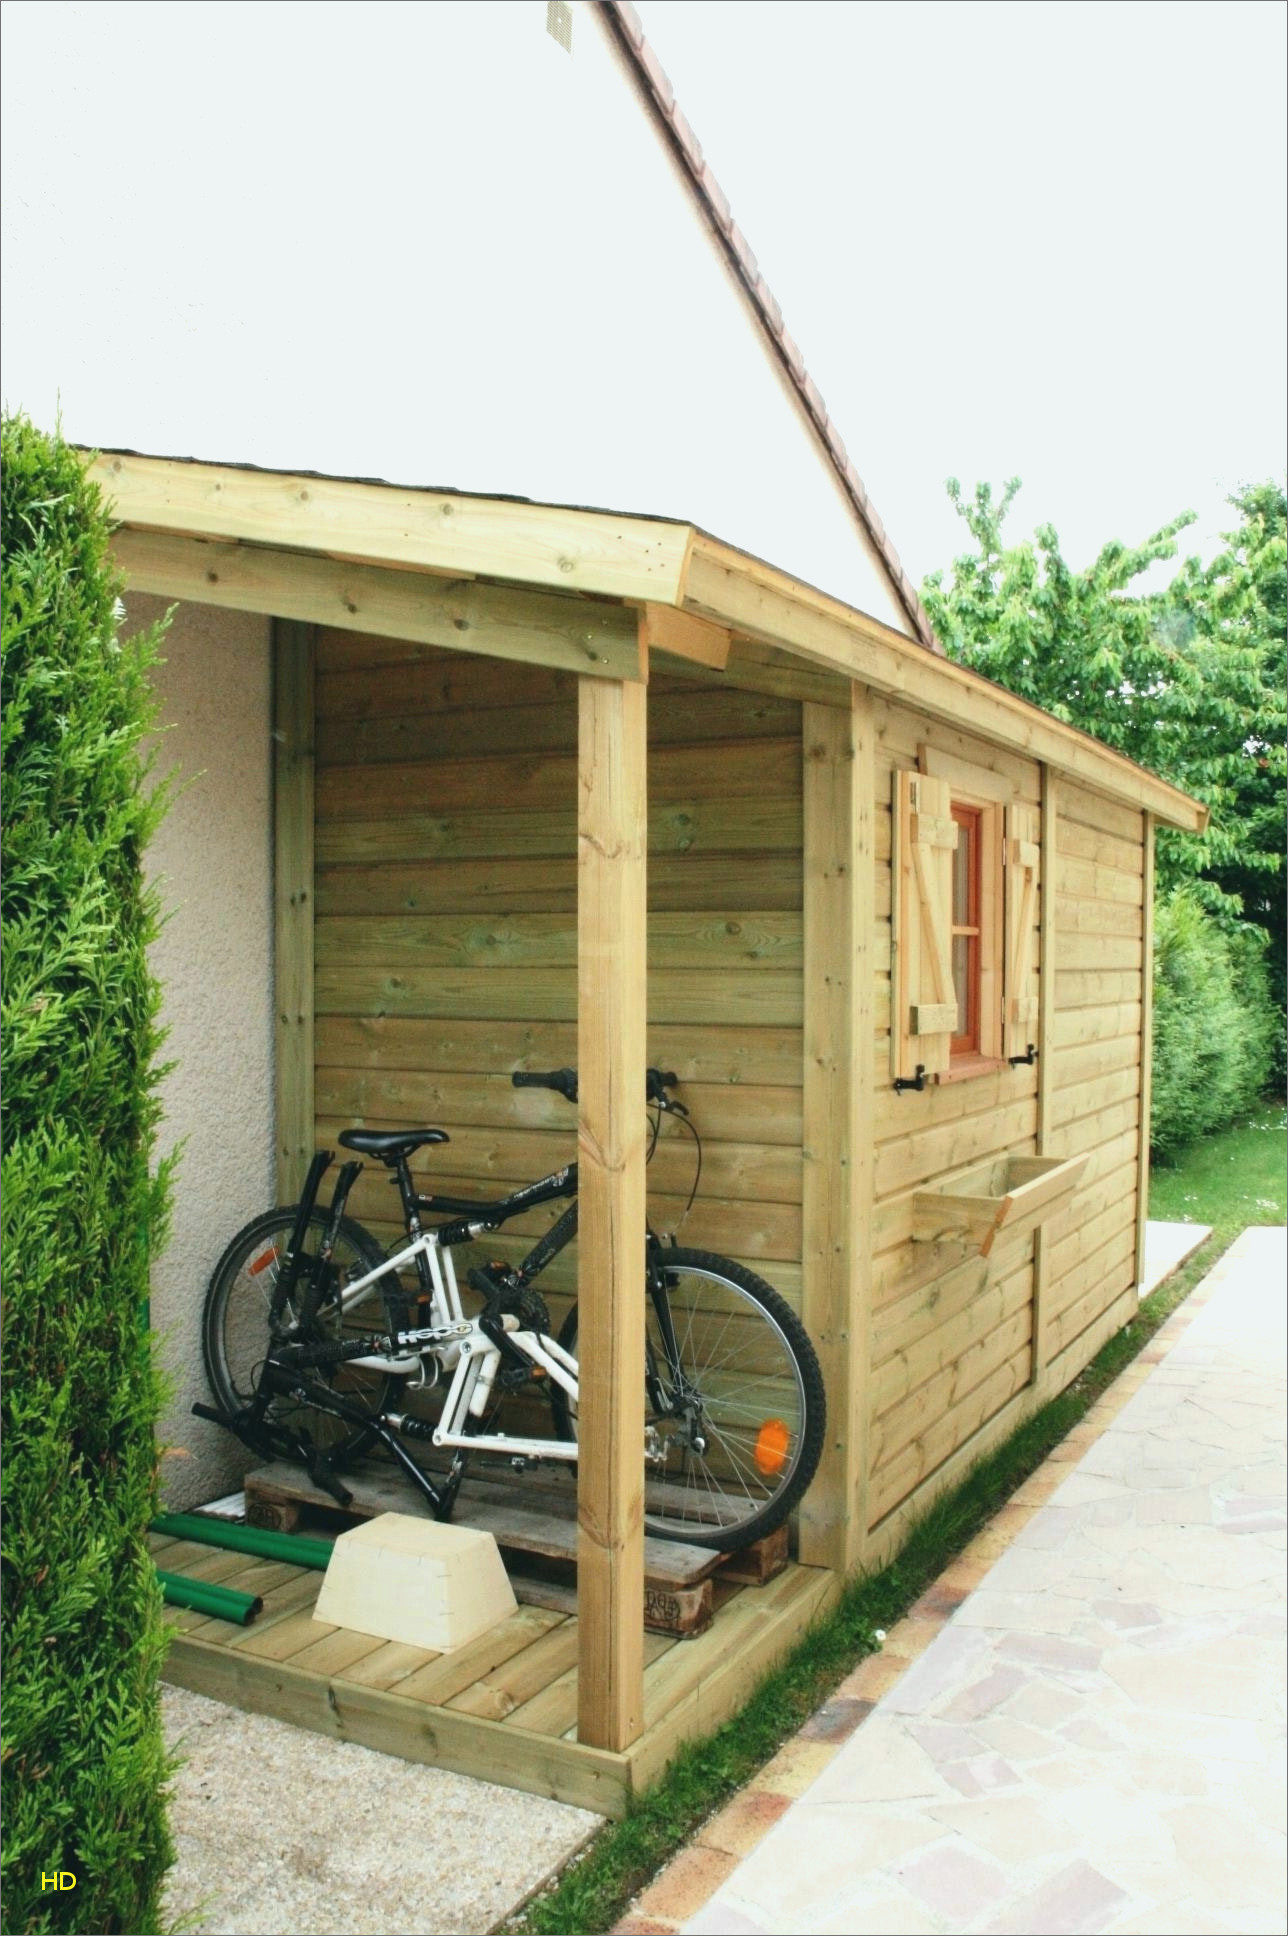 Garage: Garage Demontable Brico Depot tout Abri De Jardin Pas Cher Brico Depot